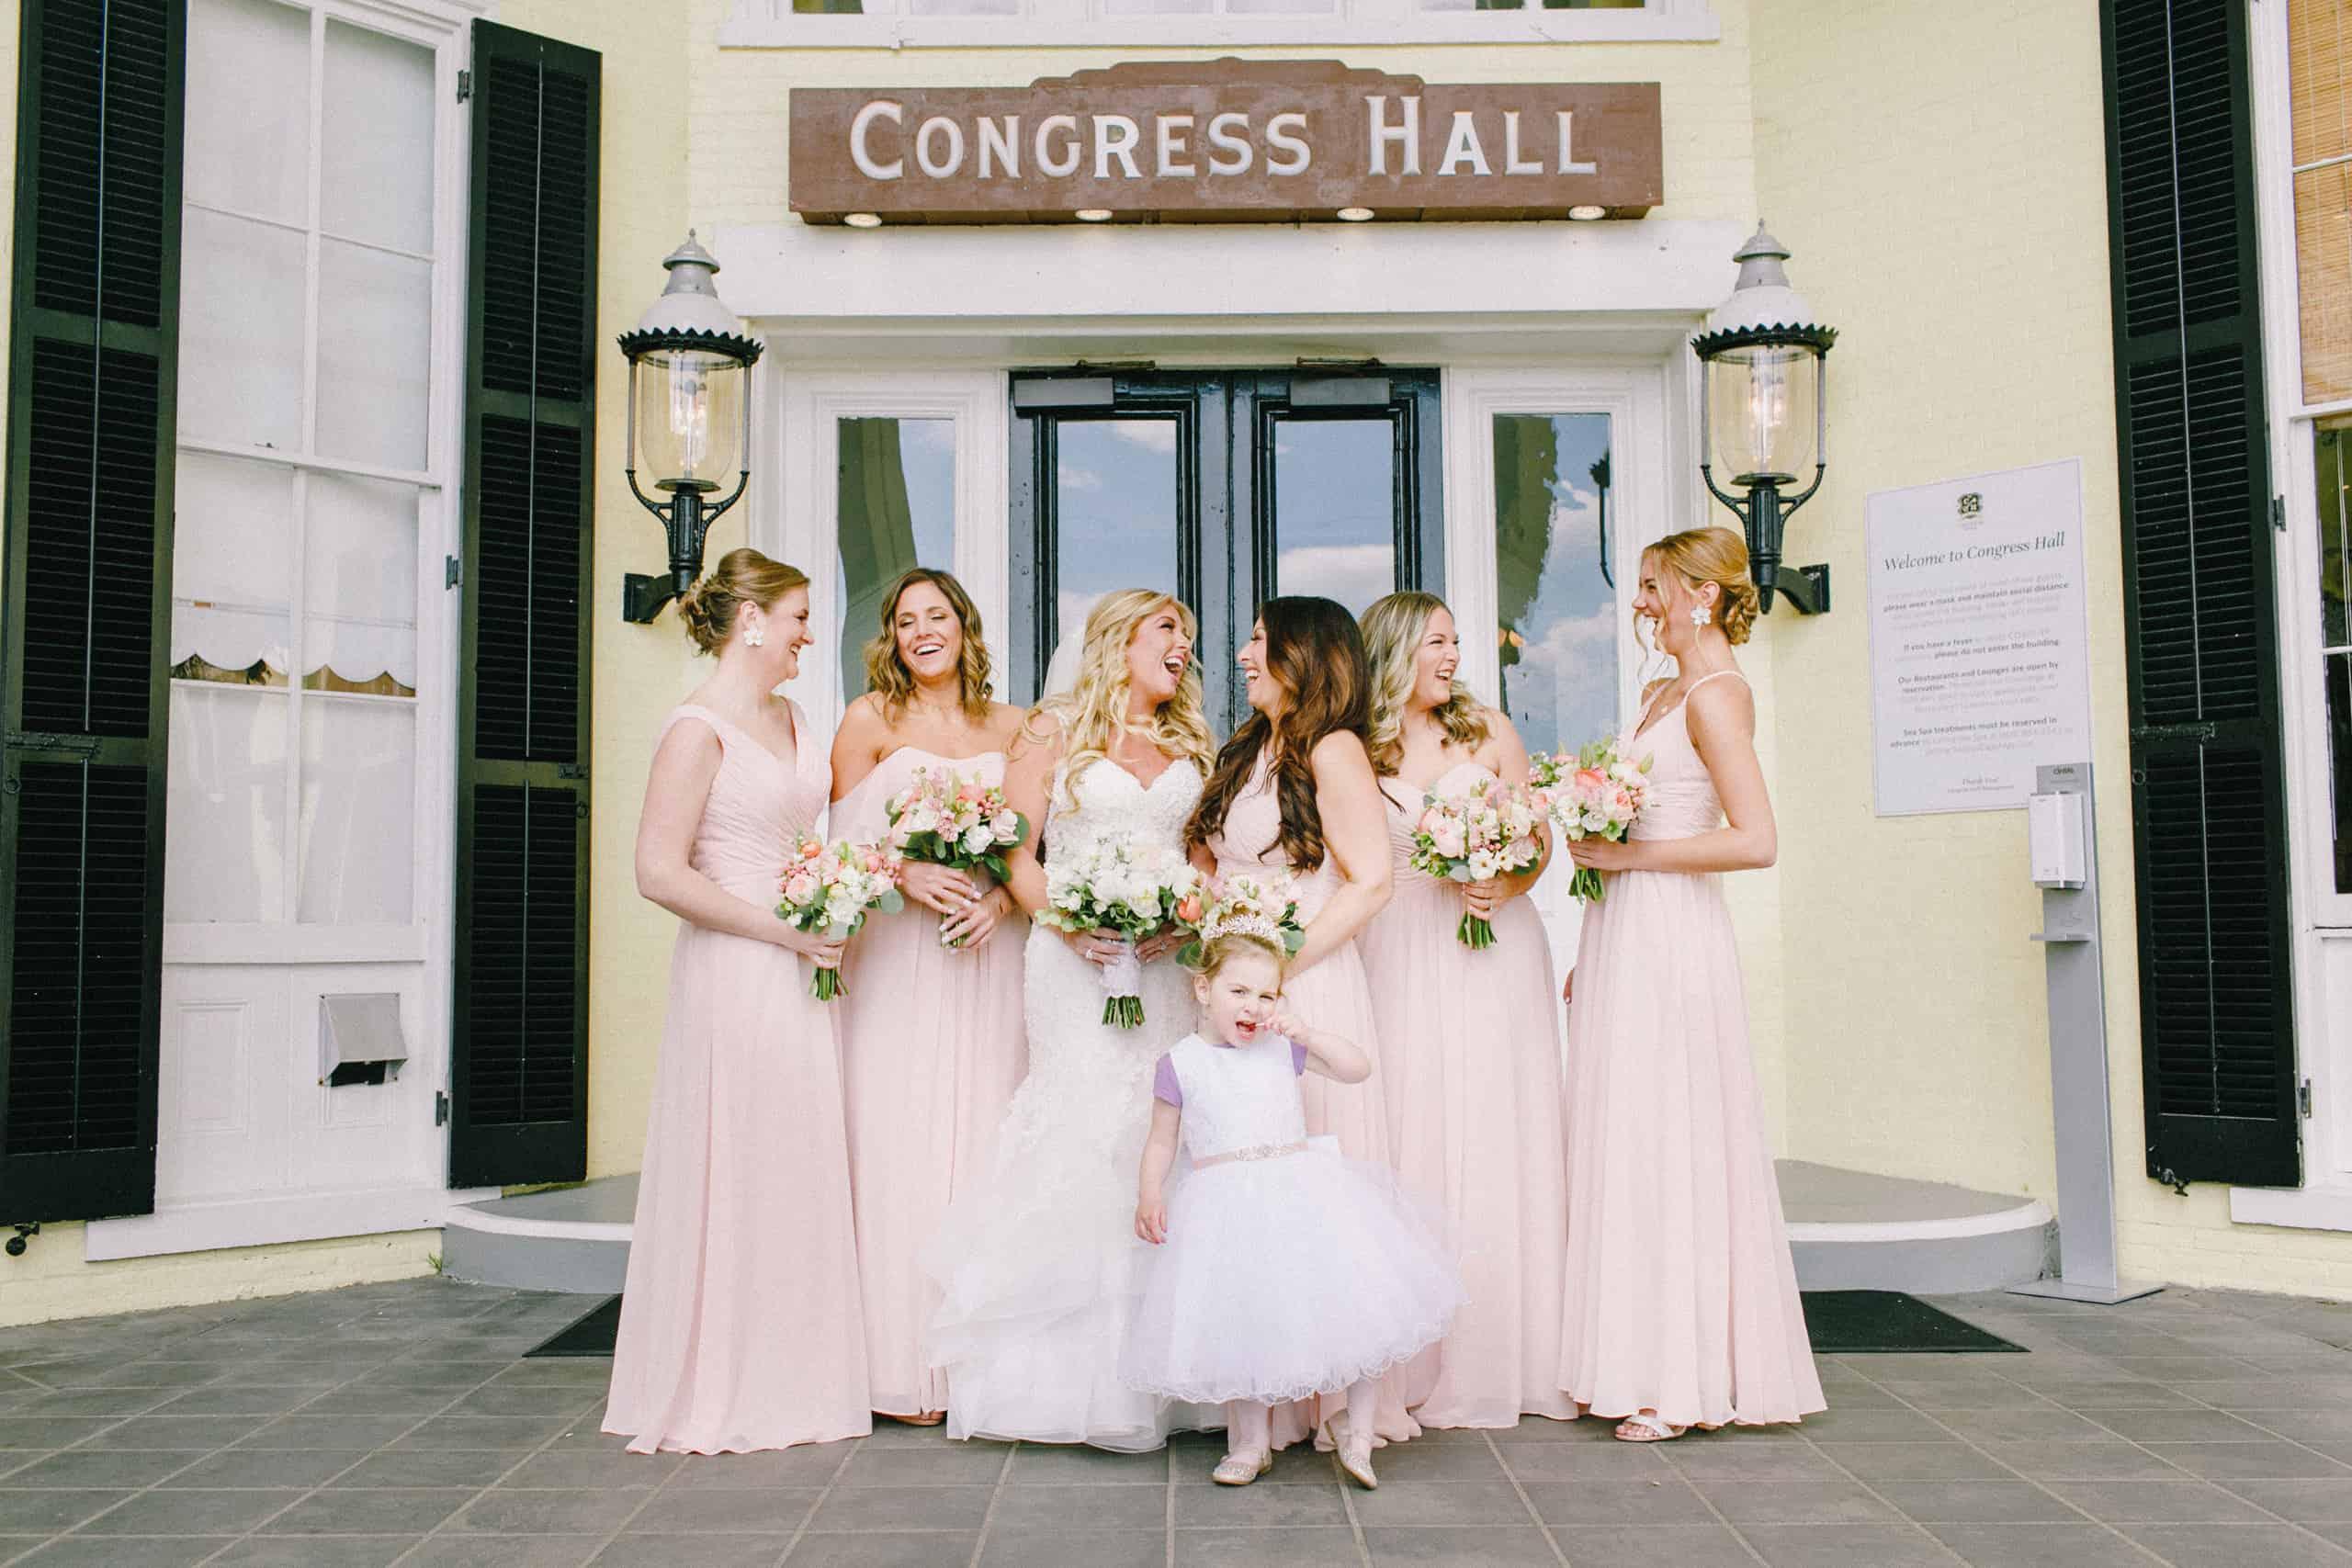 Congress Hall Bridal Party